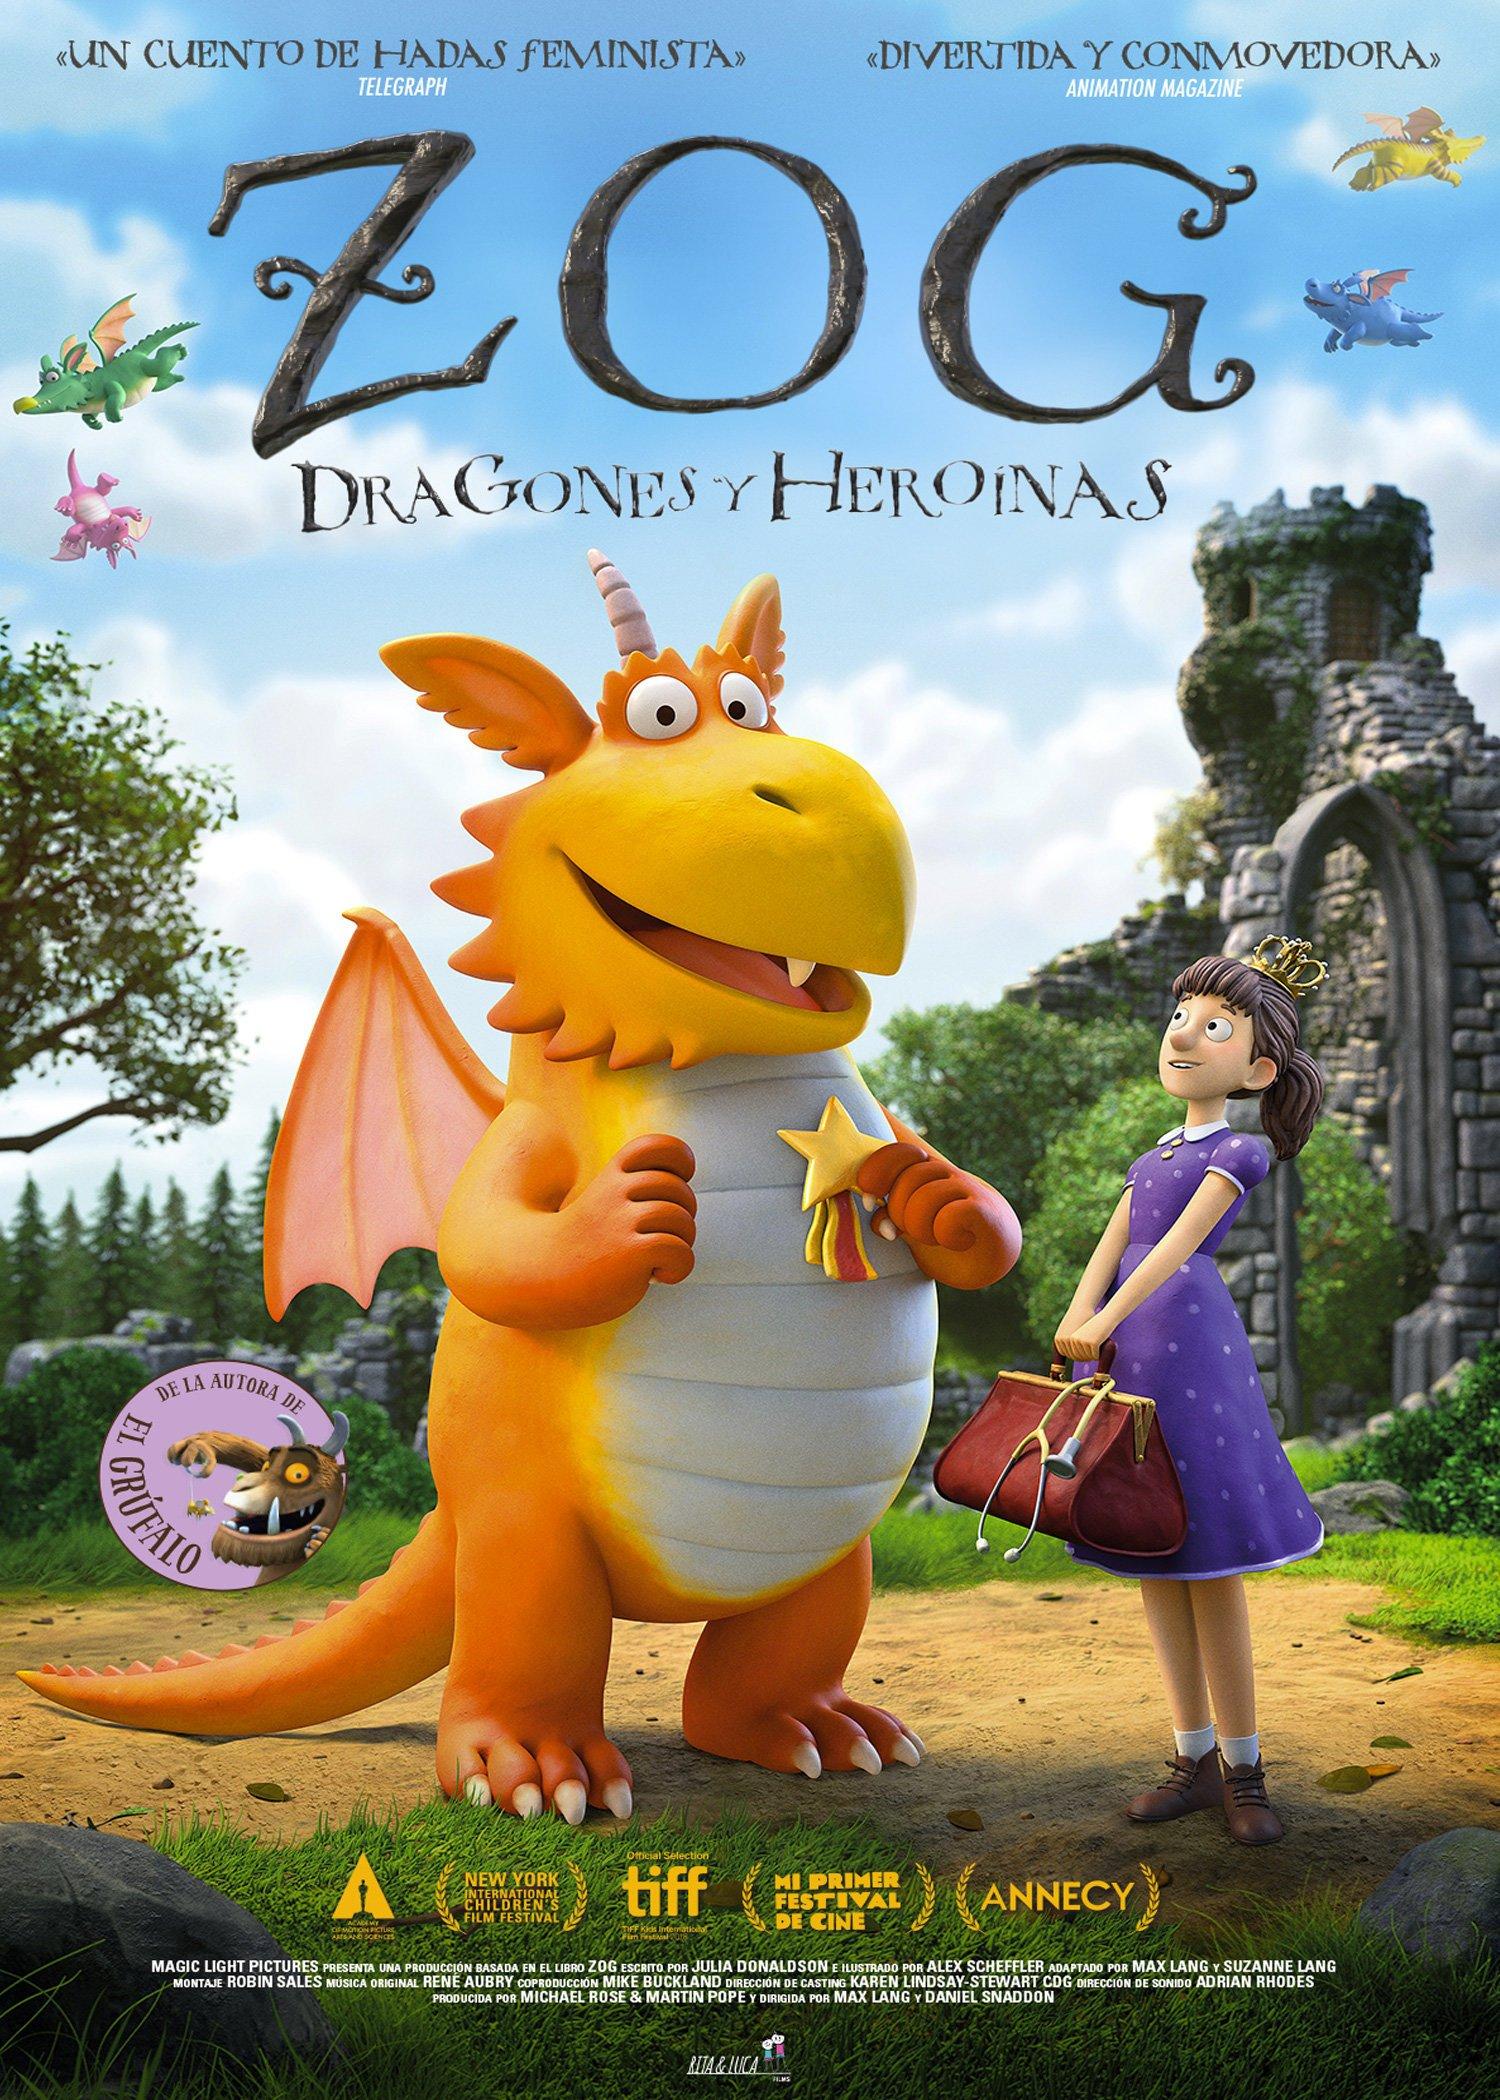 Zog, dragones y heroínas